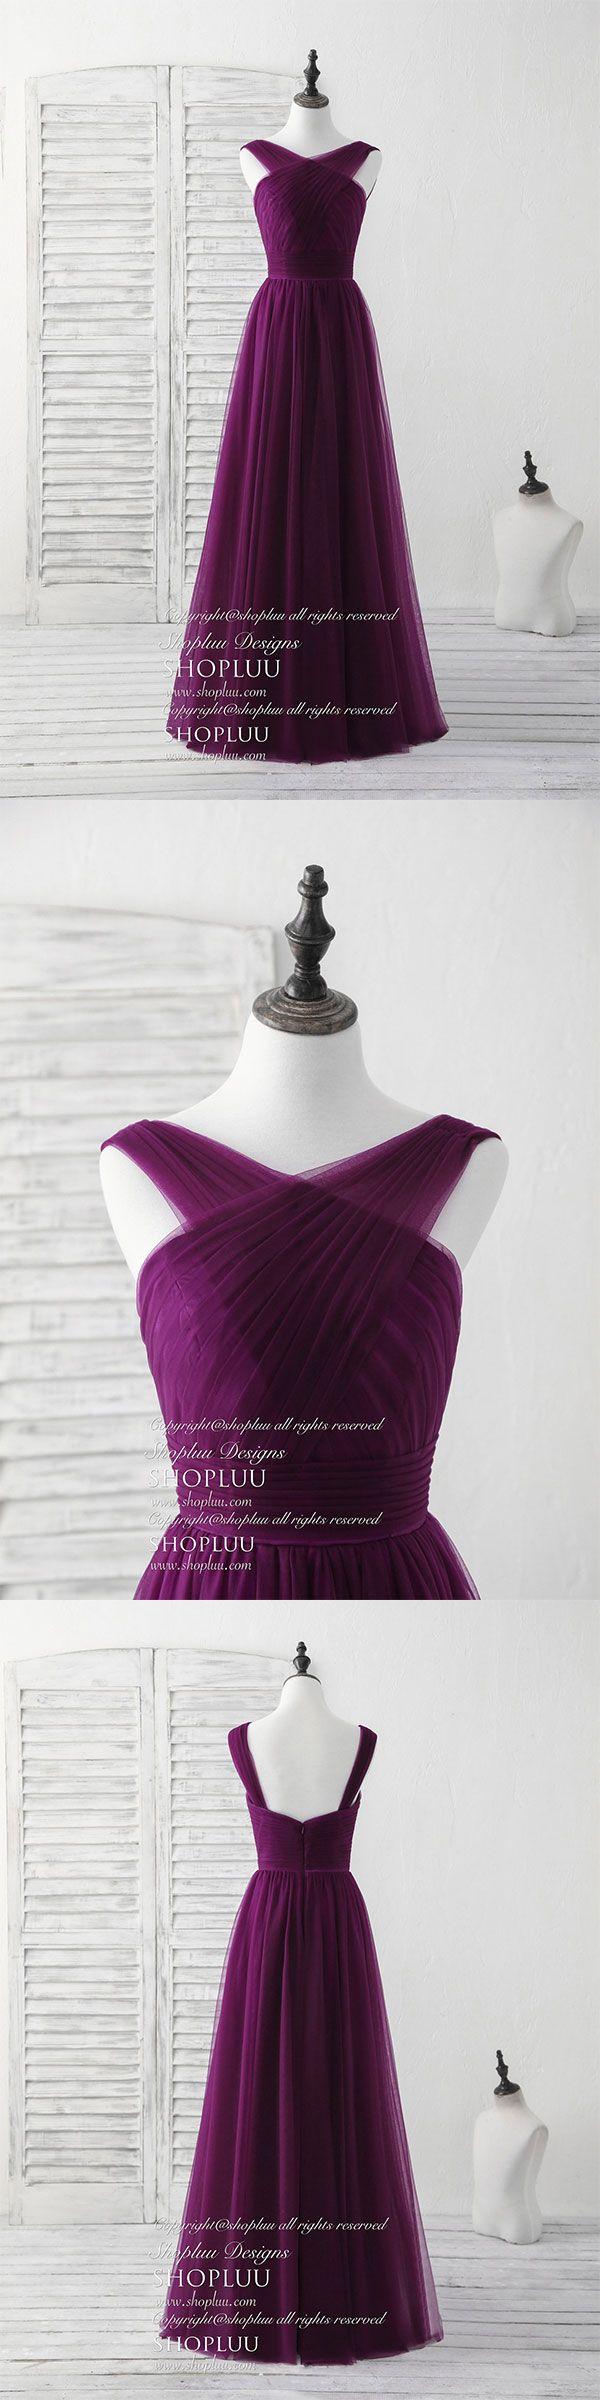 Purple v neck tulle long prom dress, tulle bridesmaid dress